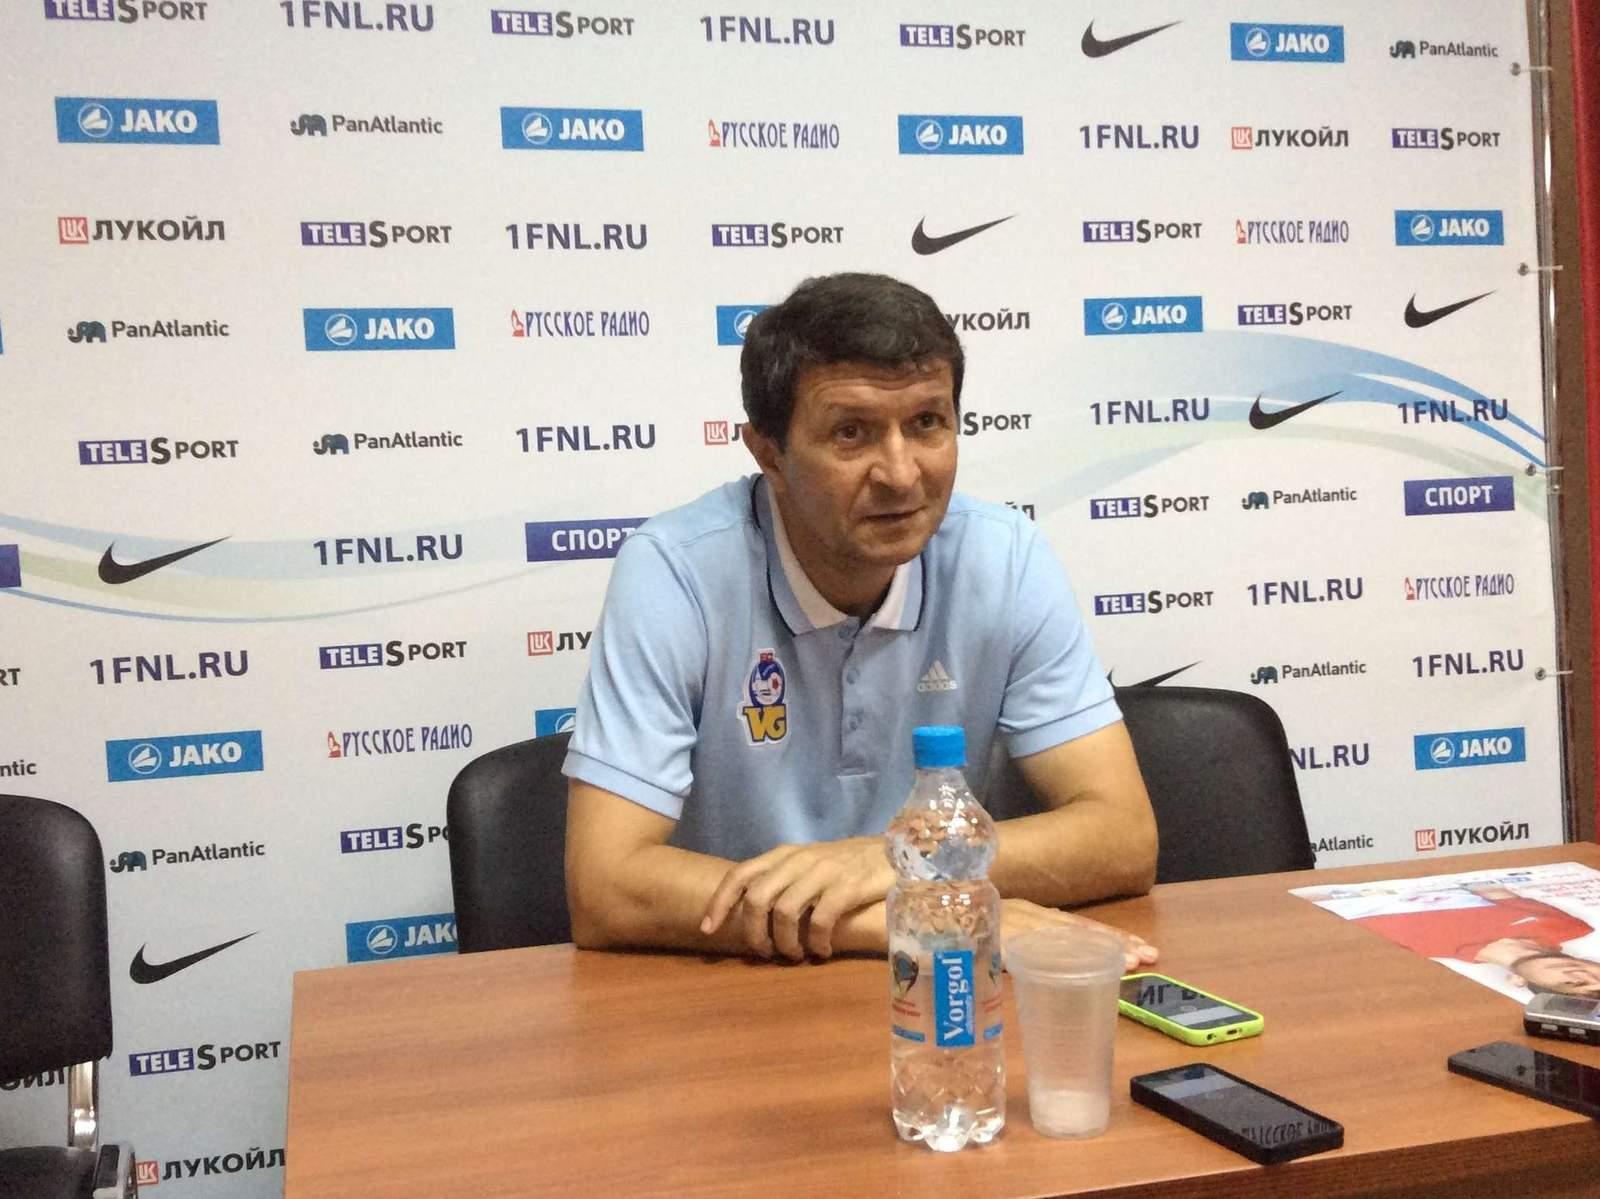 Юрий Газзаев назвал свою зарплату в «Енисее»